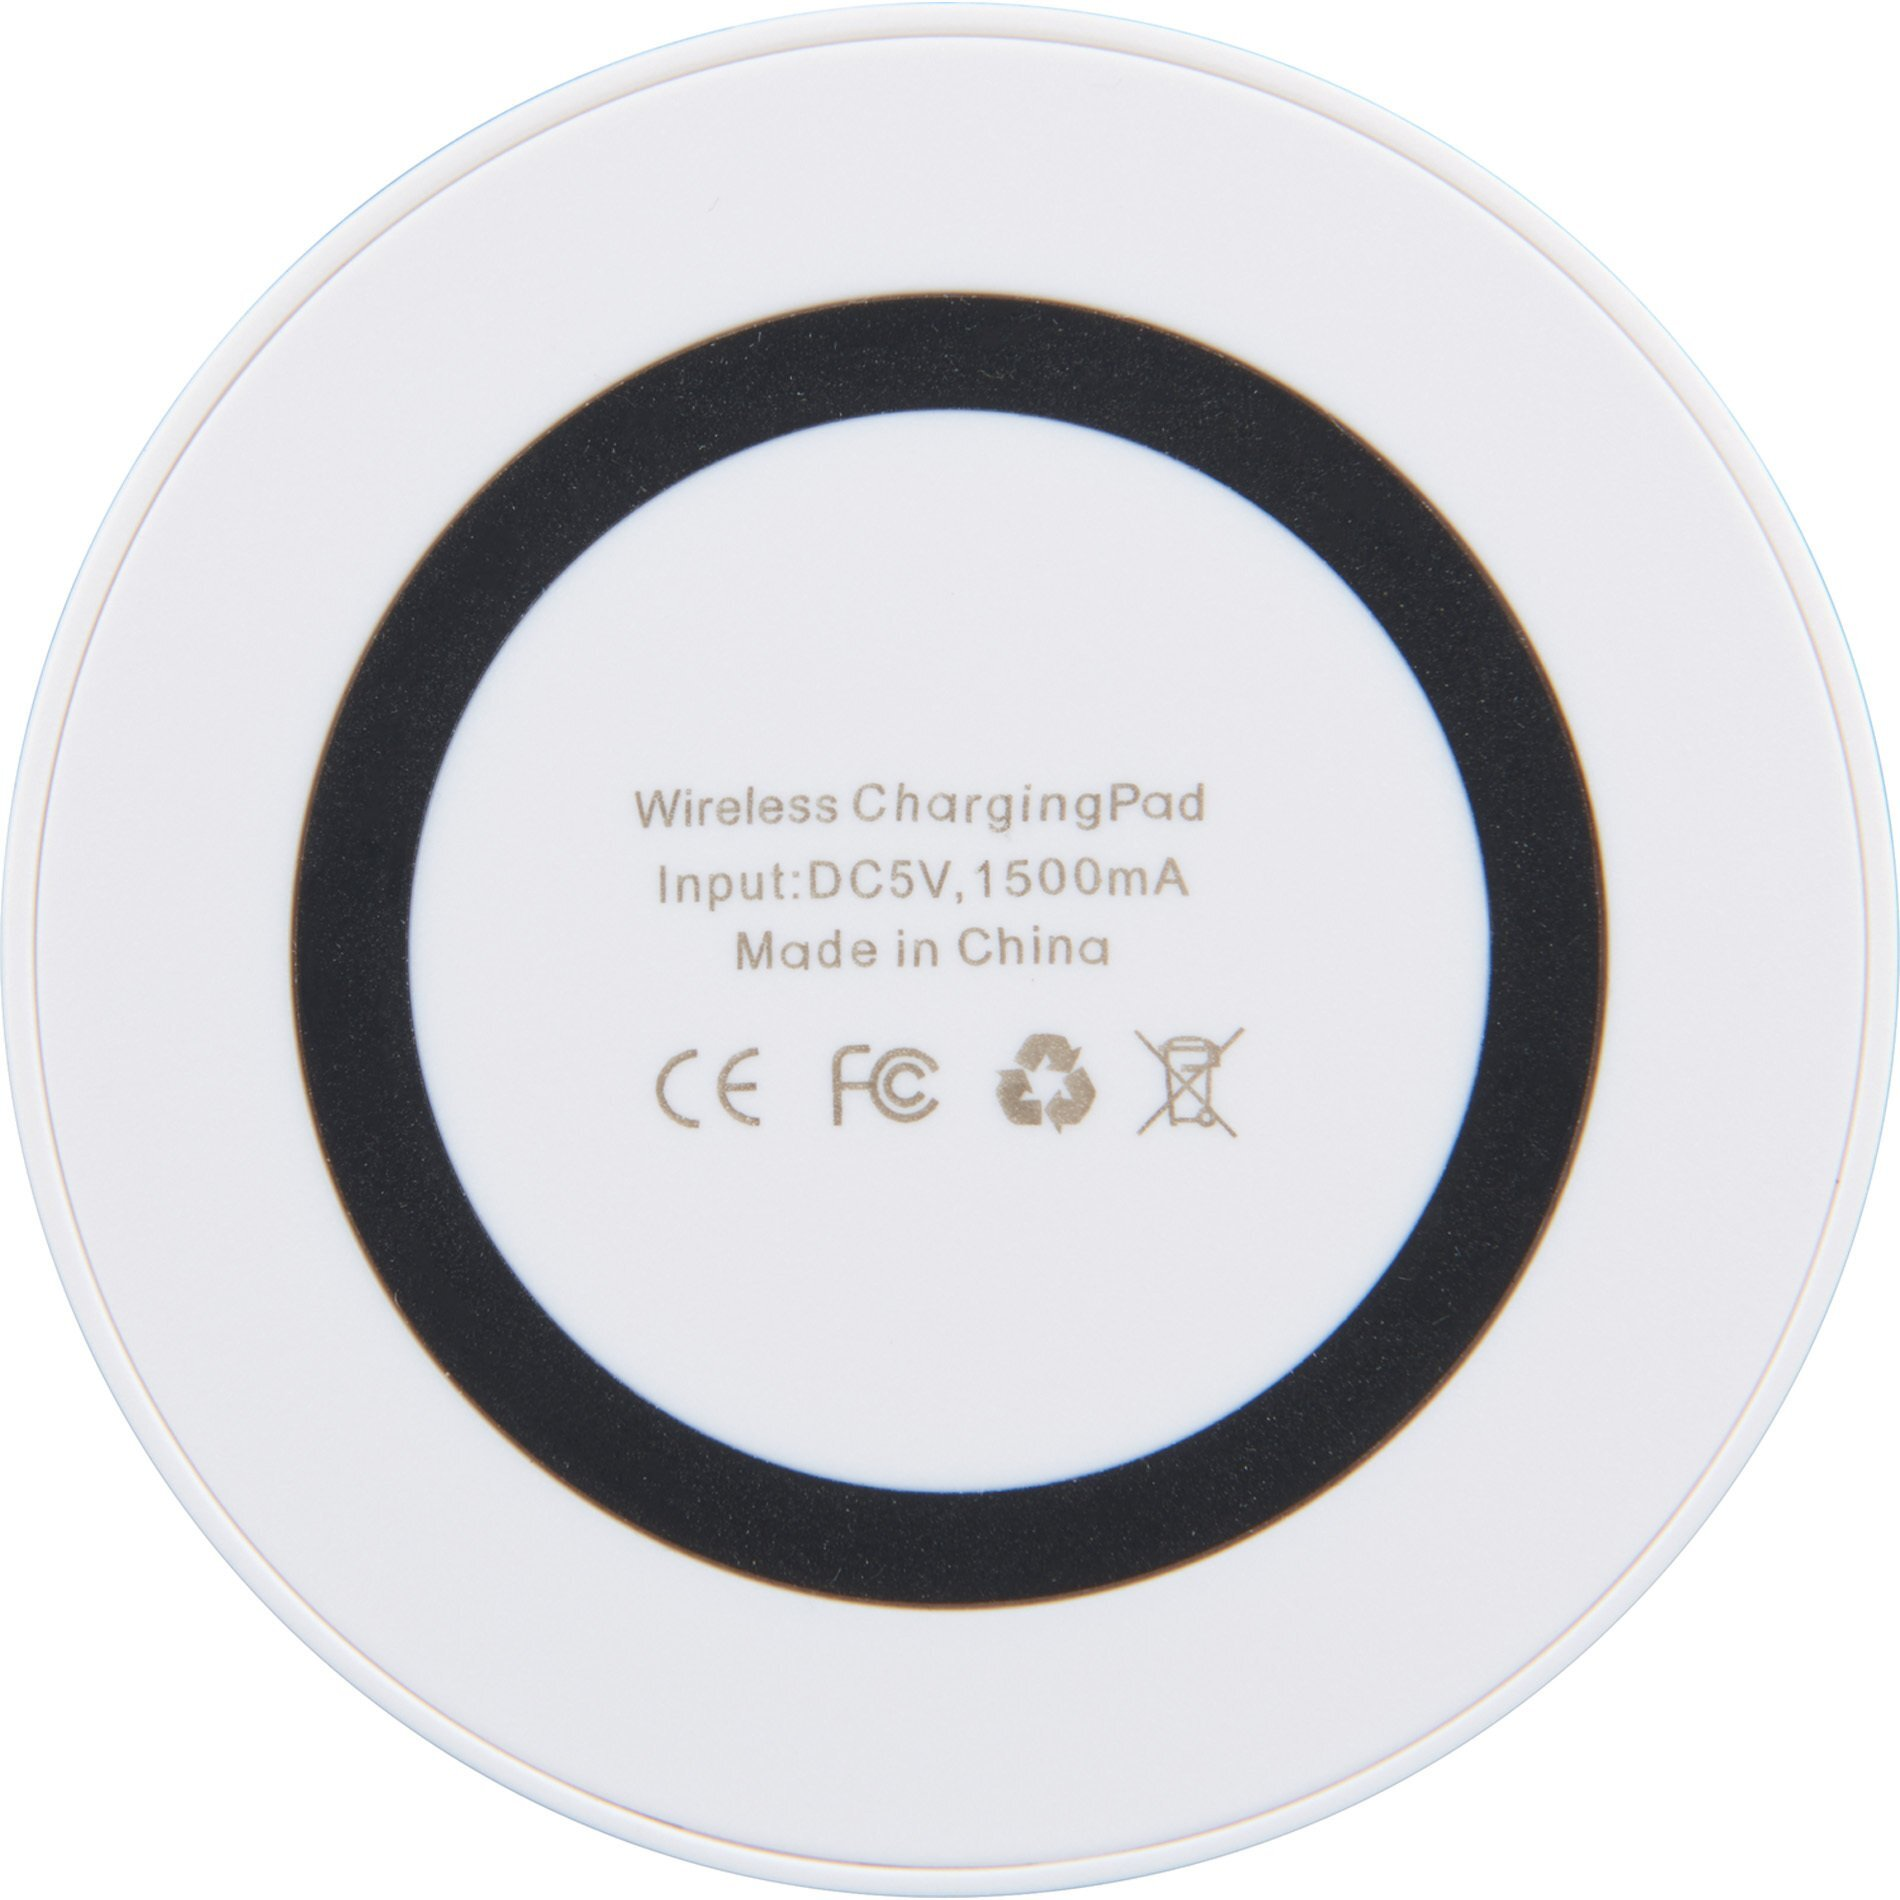 Quake Wireless Charging Pad